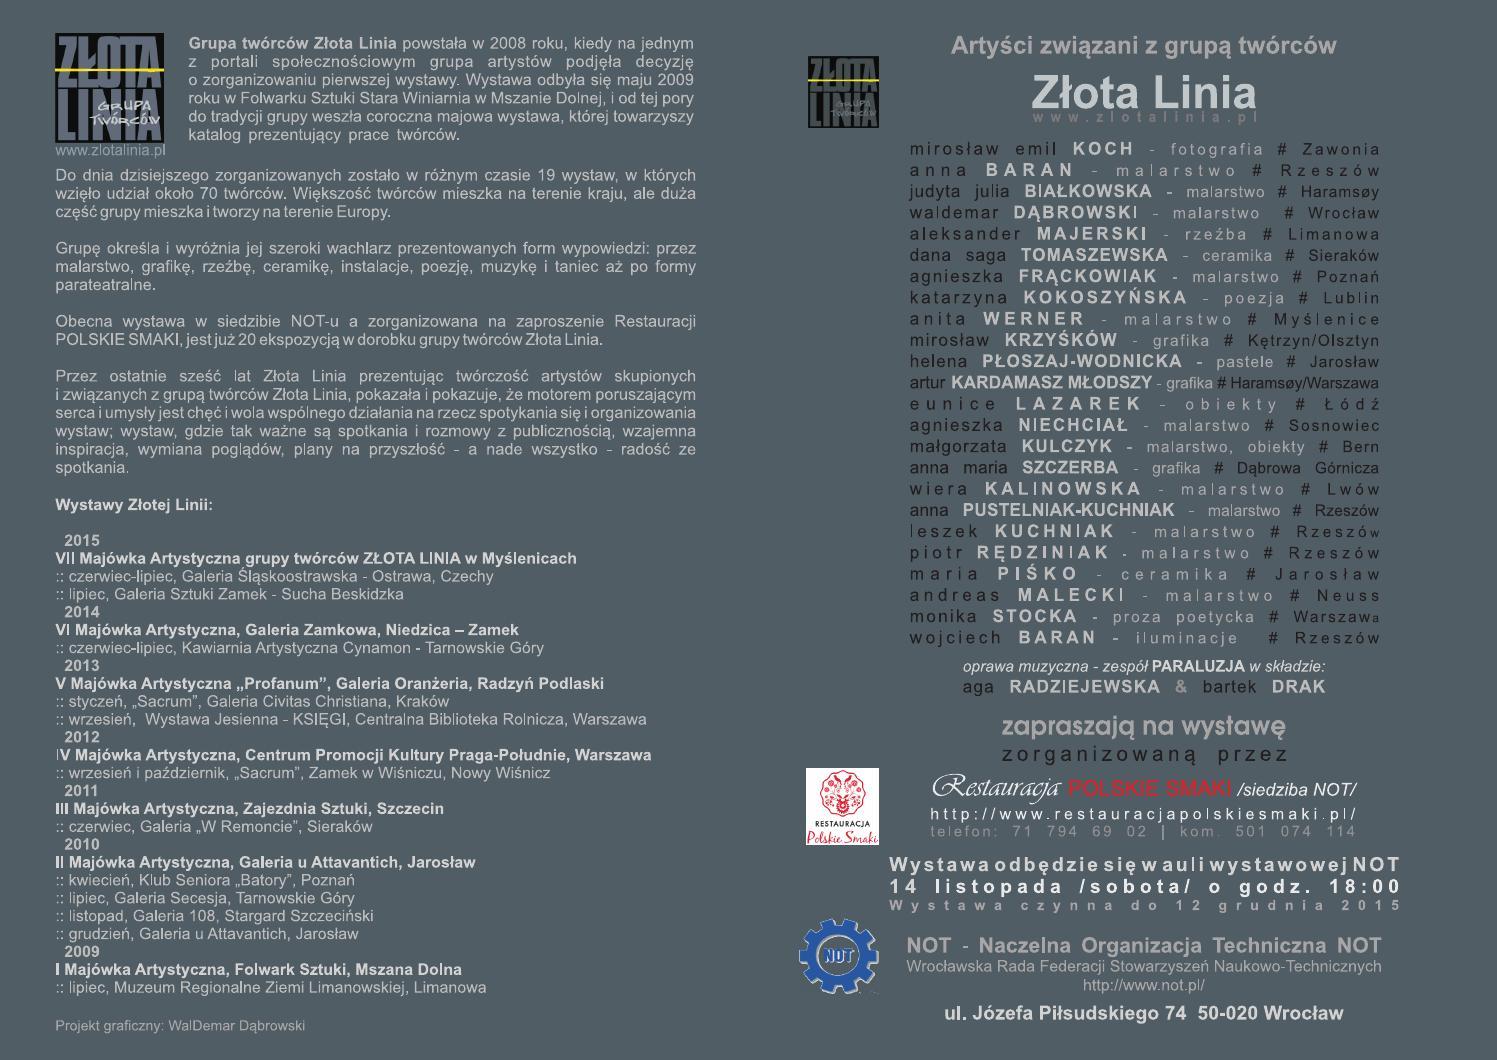 Invitation Folder An Exhibition Wroclaw 2015 Not Polish